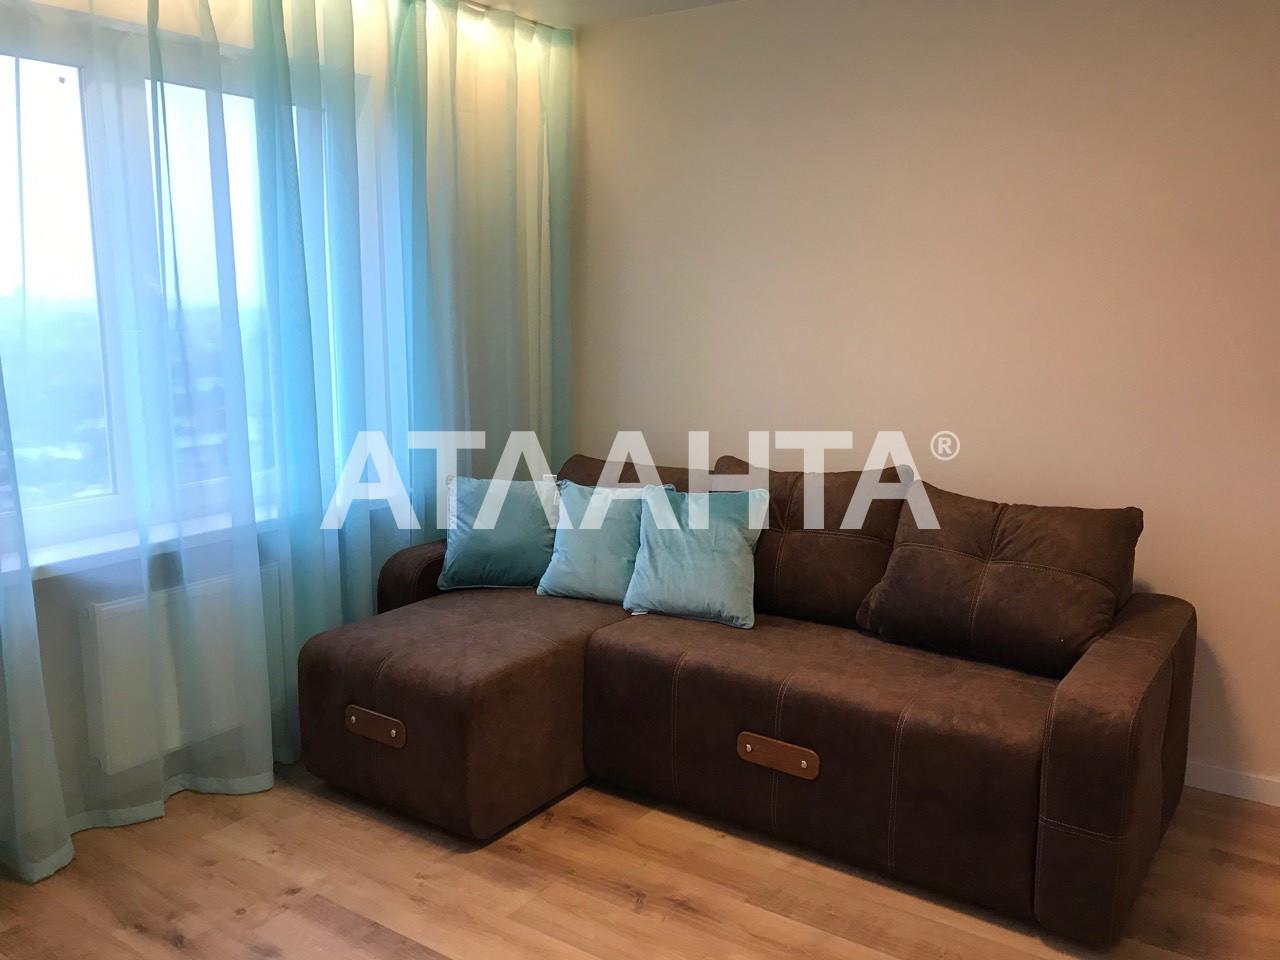 Продается 1-комнатная Квартира на ул. Ул. Ломоносова — 51 200 у.е. (фото №5)